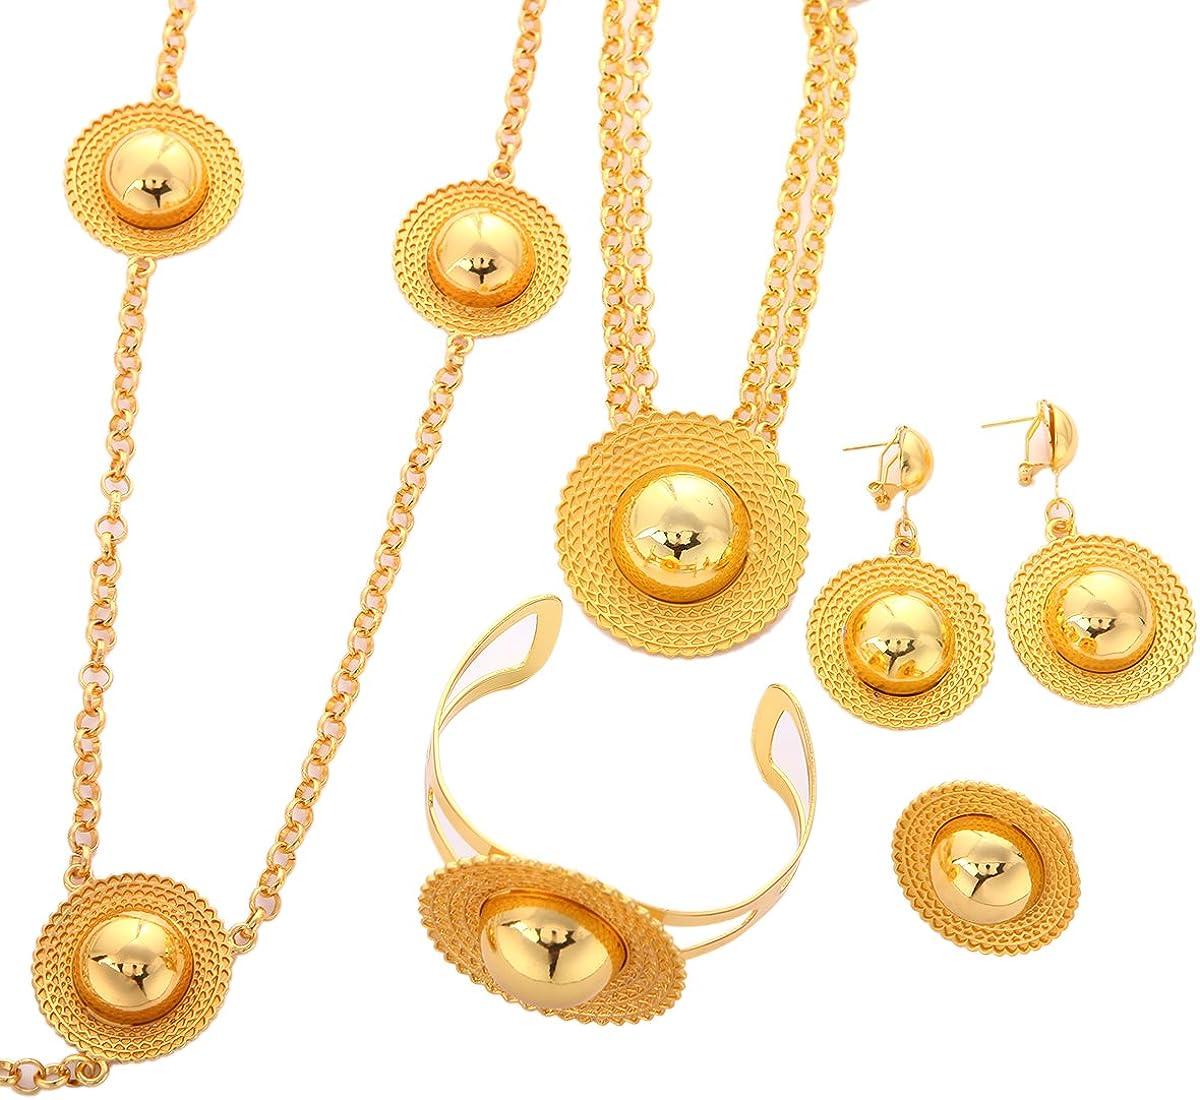 Ethiopian Cross Set Jewelry Gold Plated Habesha Sets Wedding Eritrea Ethiopia Jewelry